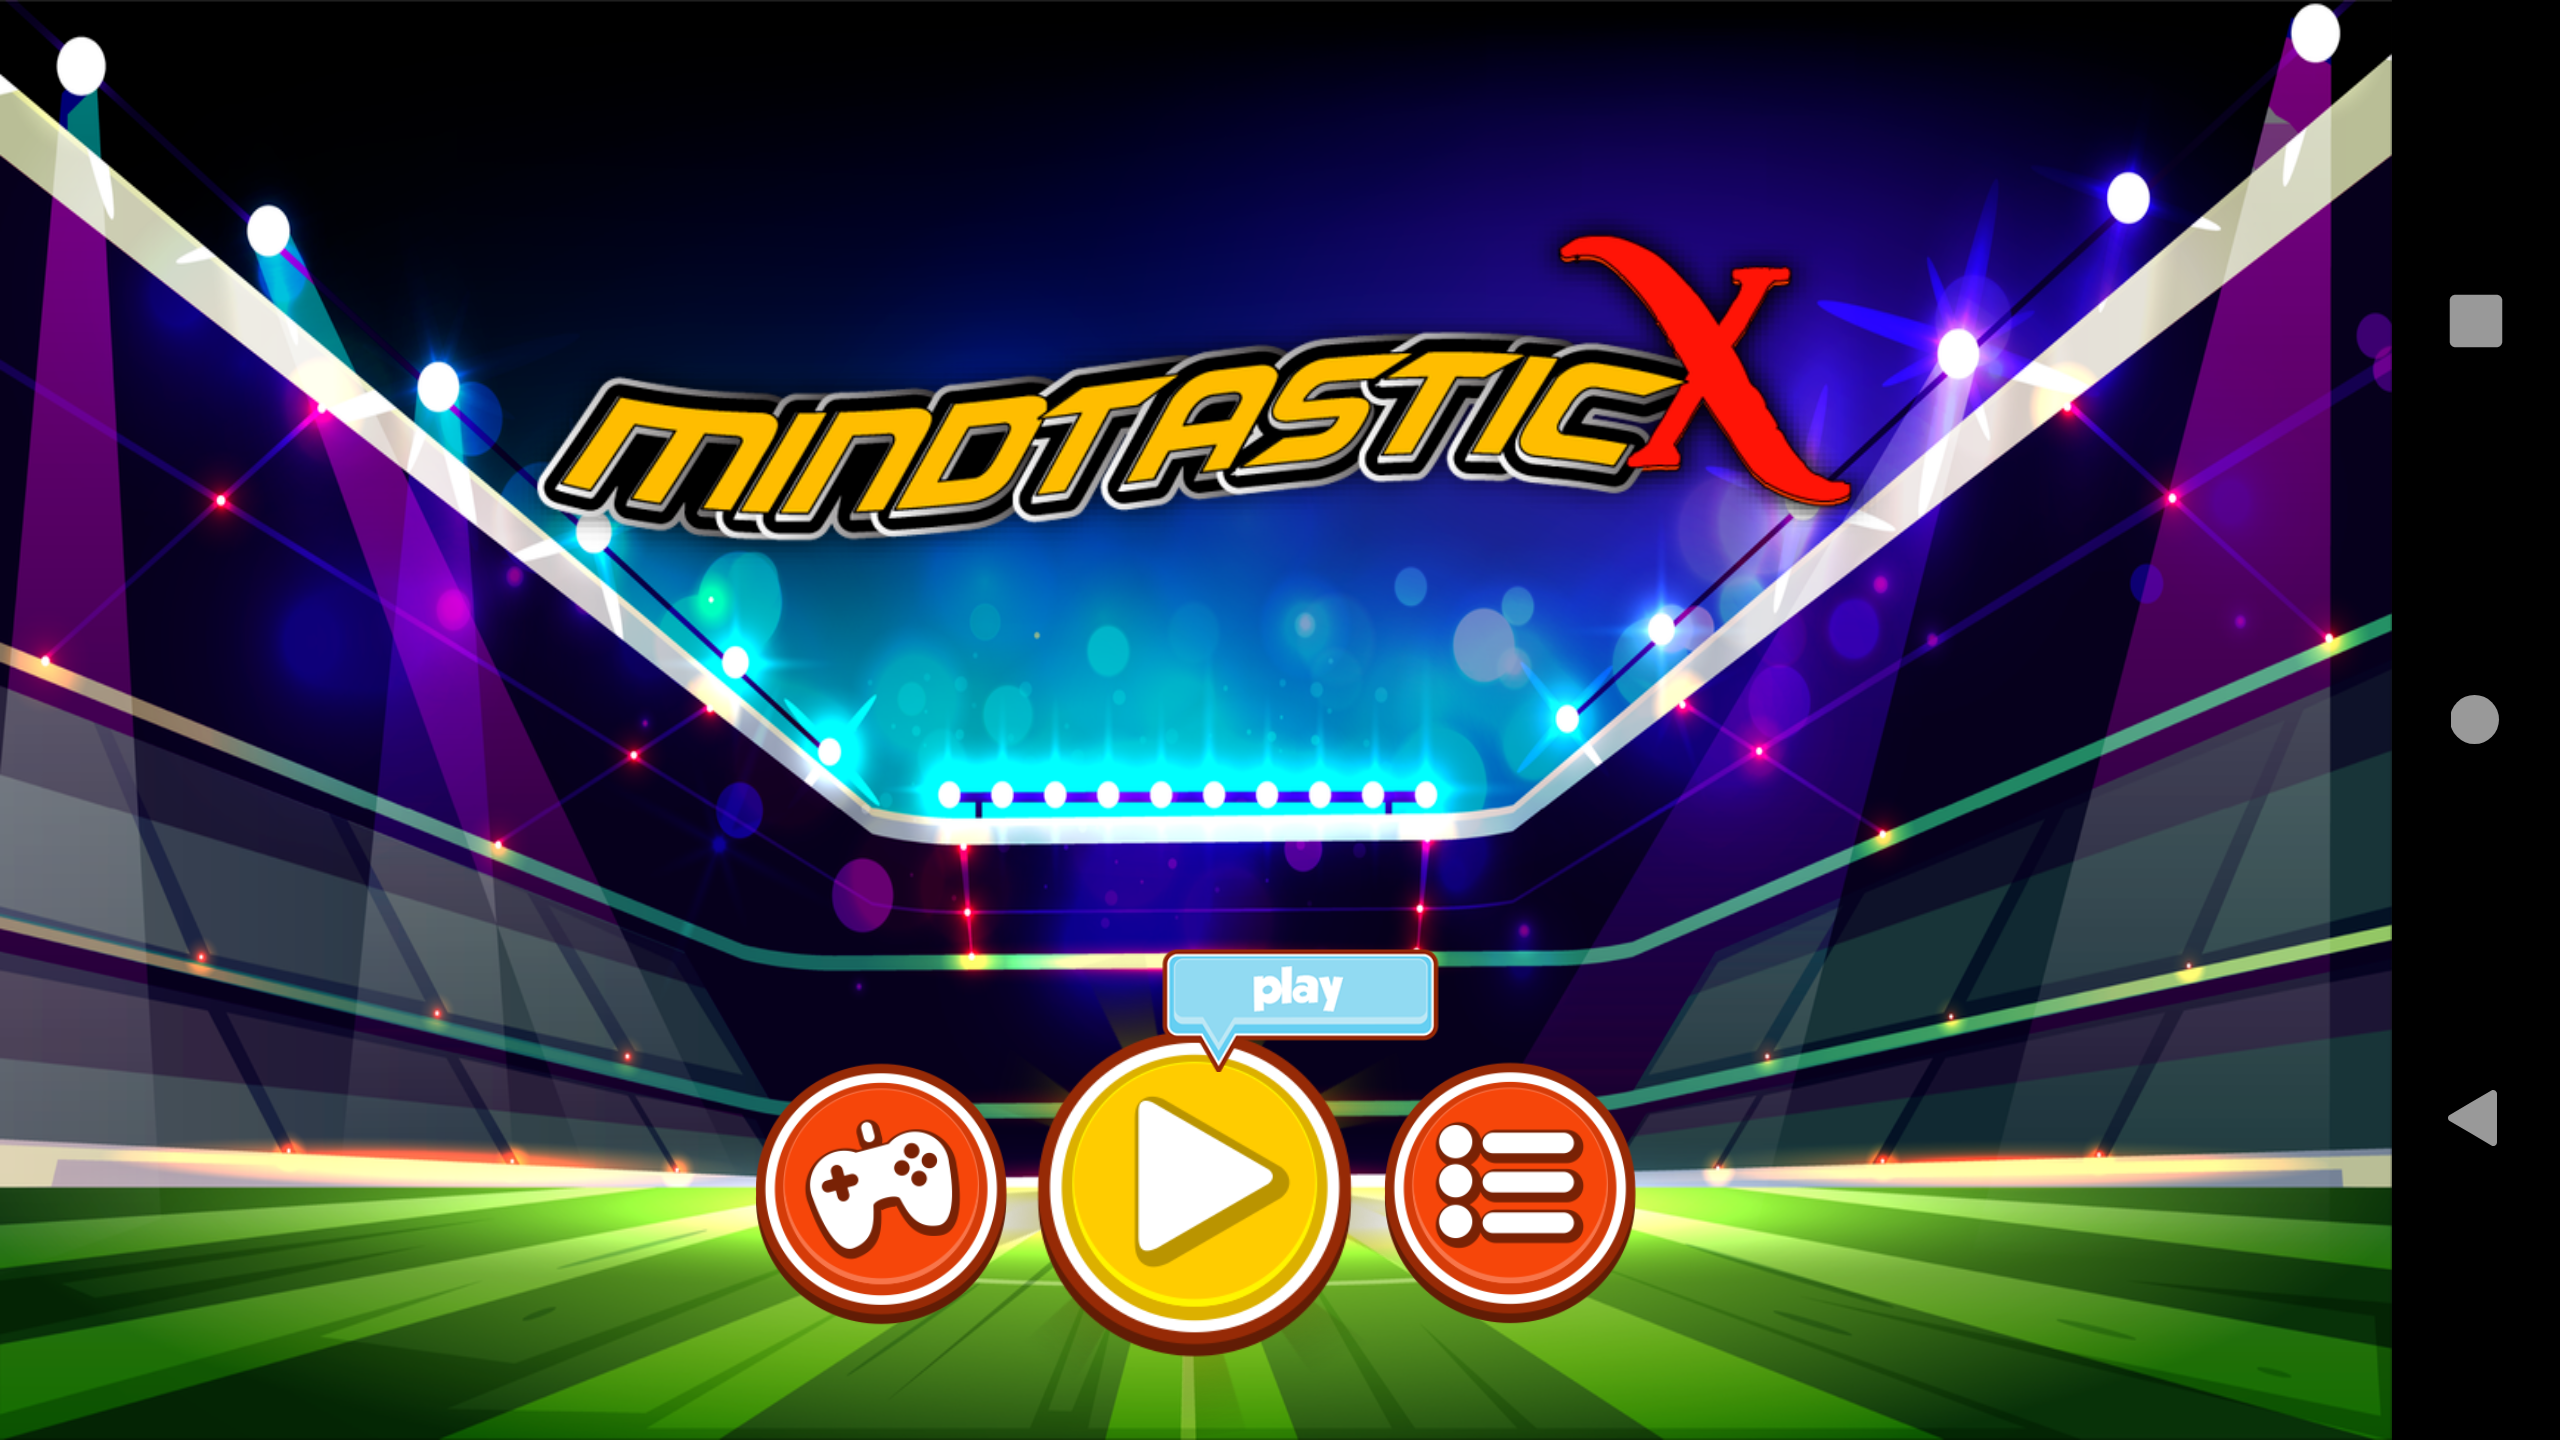 MindtasticX